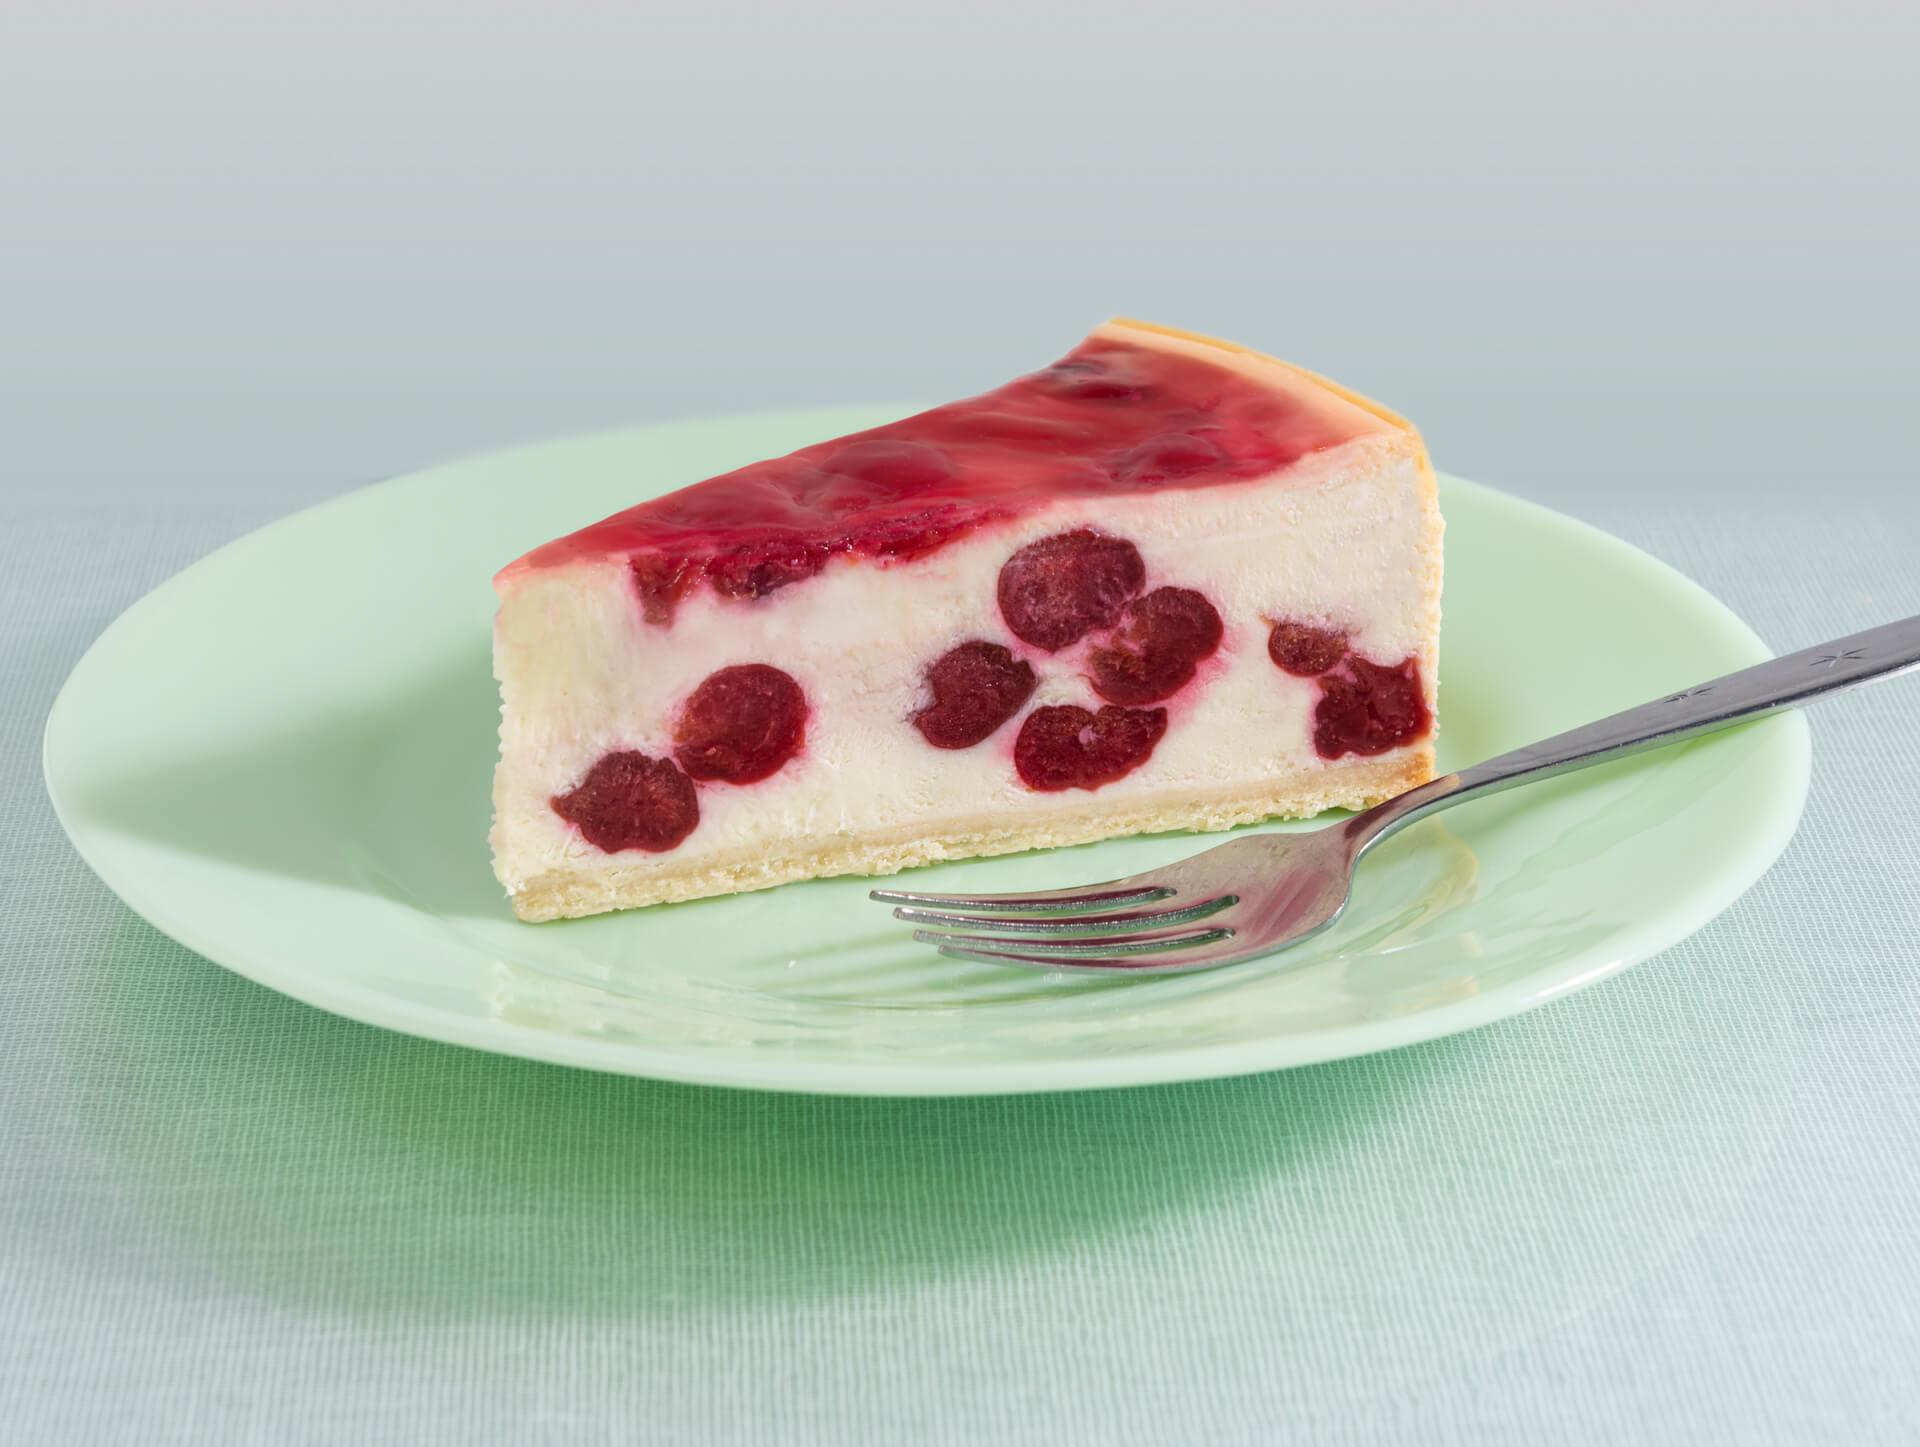 A lice of Eli's Cherry Vanilla Cheesecake